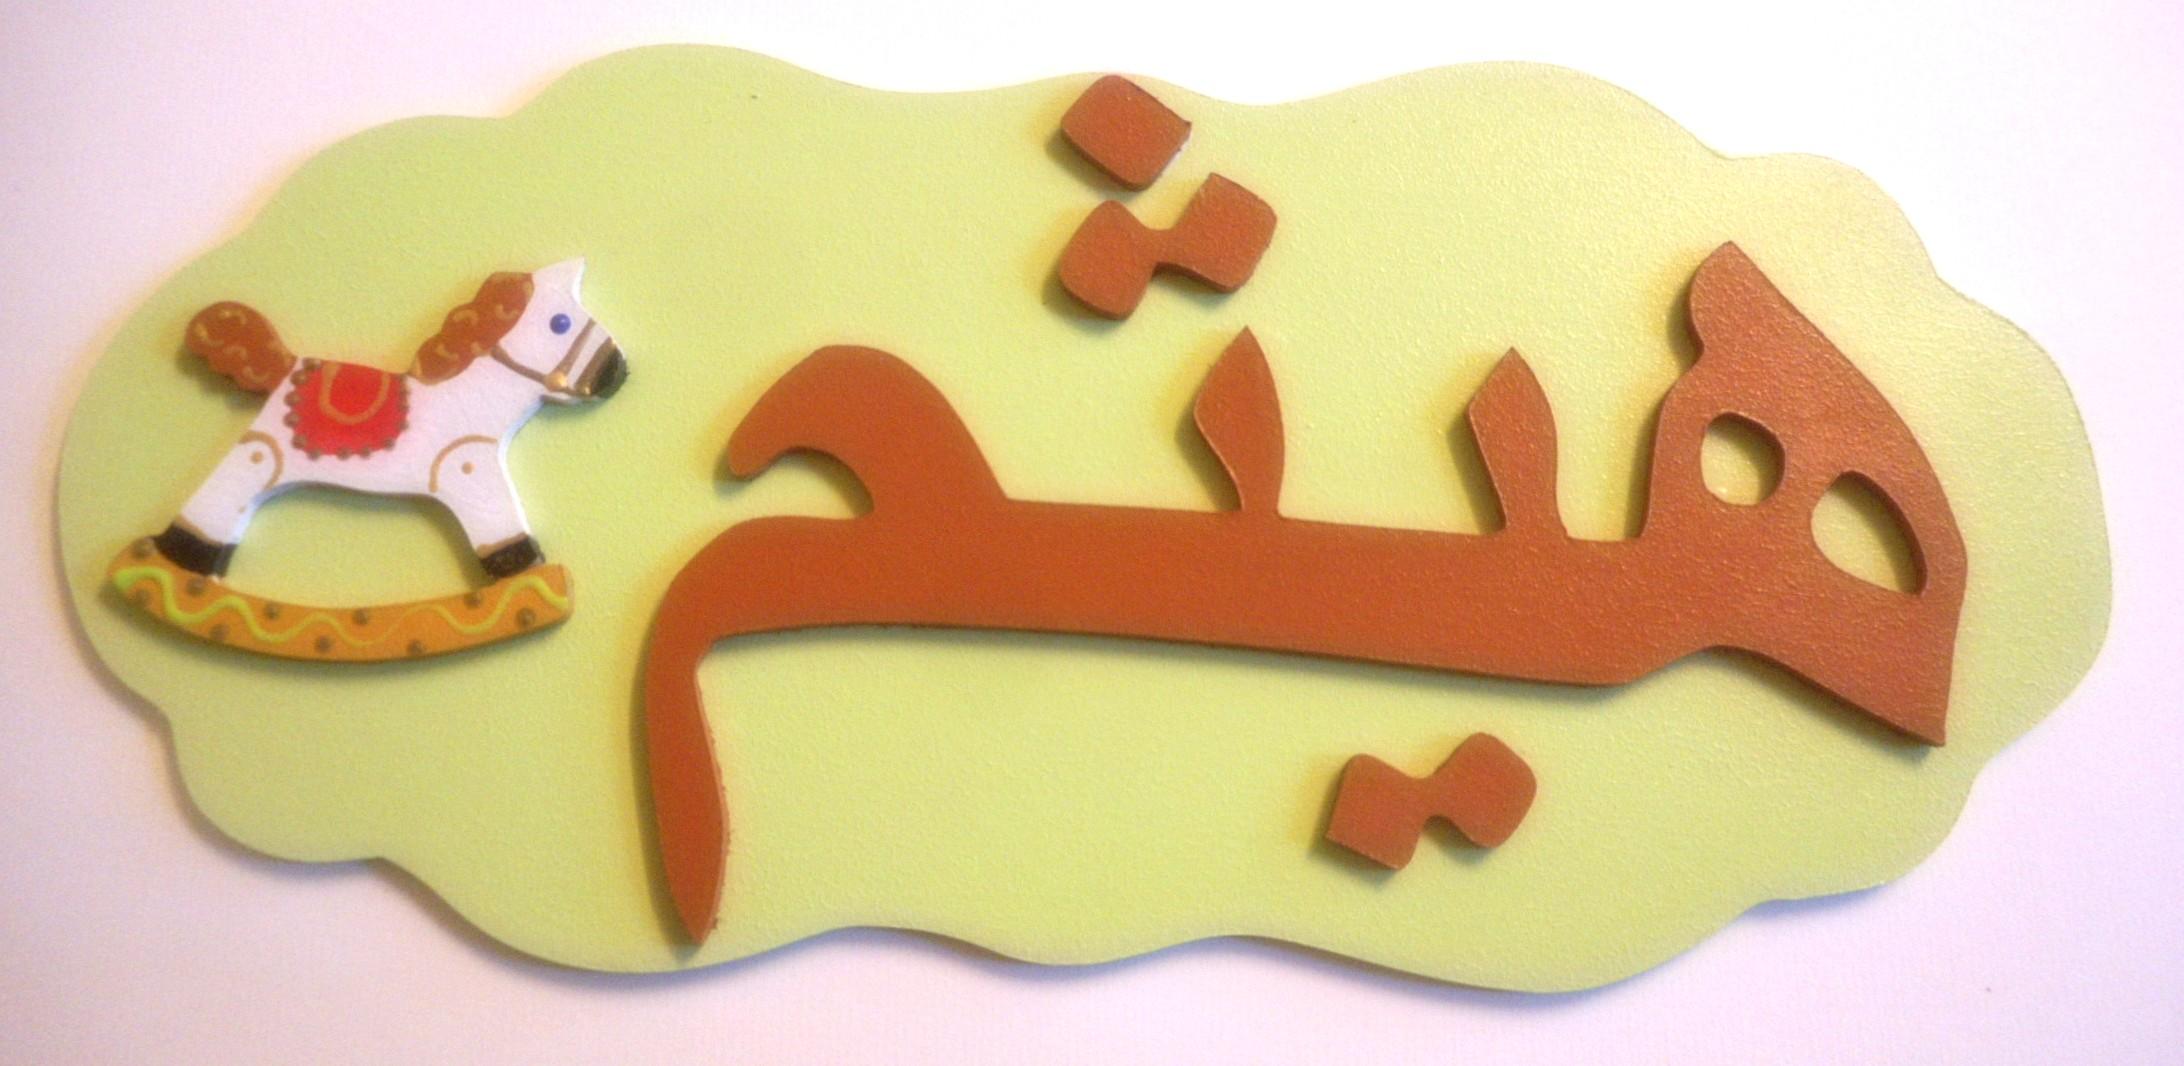 plaque de pr nom arabe lettre bois. Black Bedroom Furniture Sets. Home Design Ideas